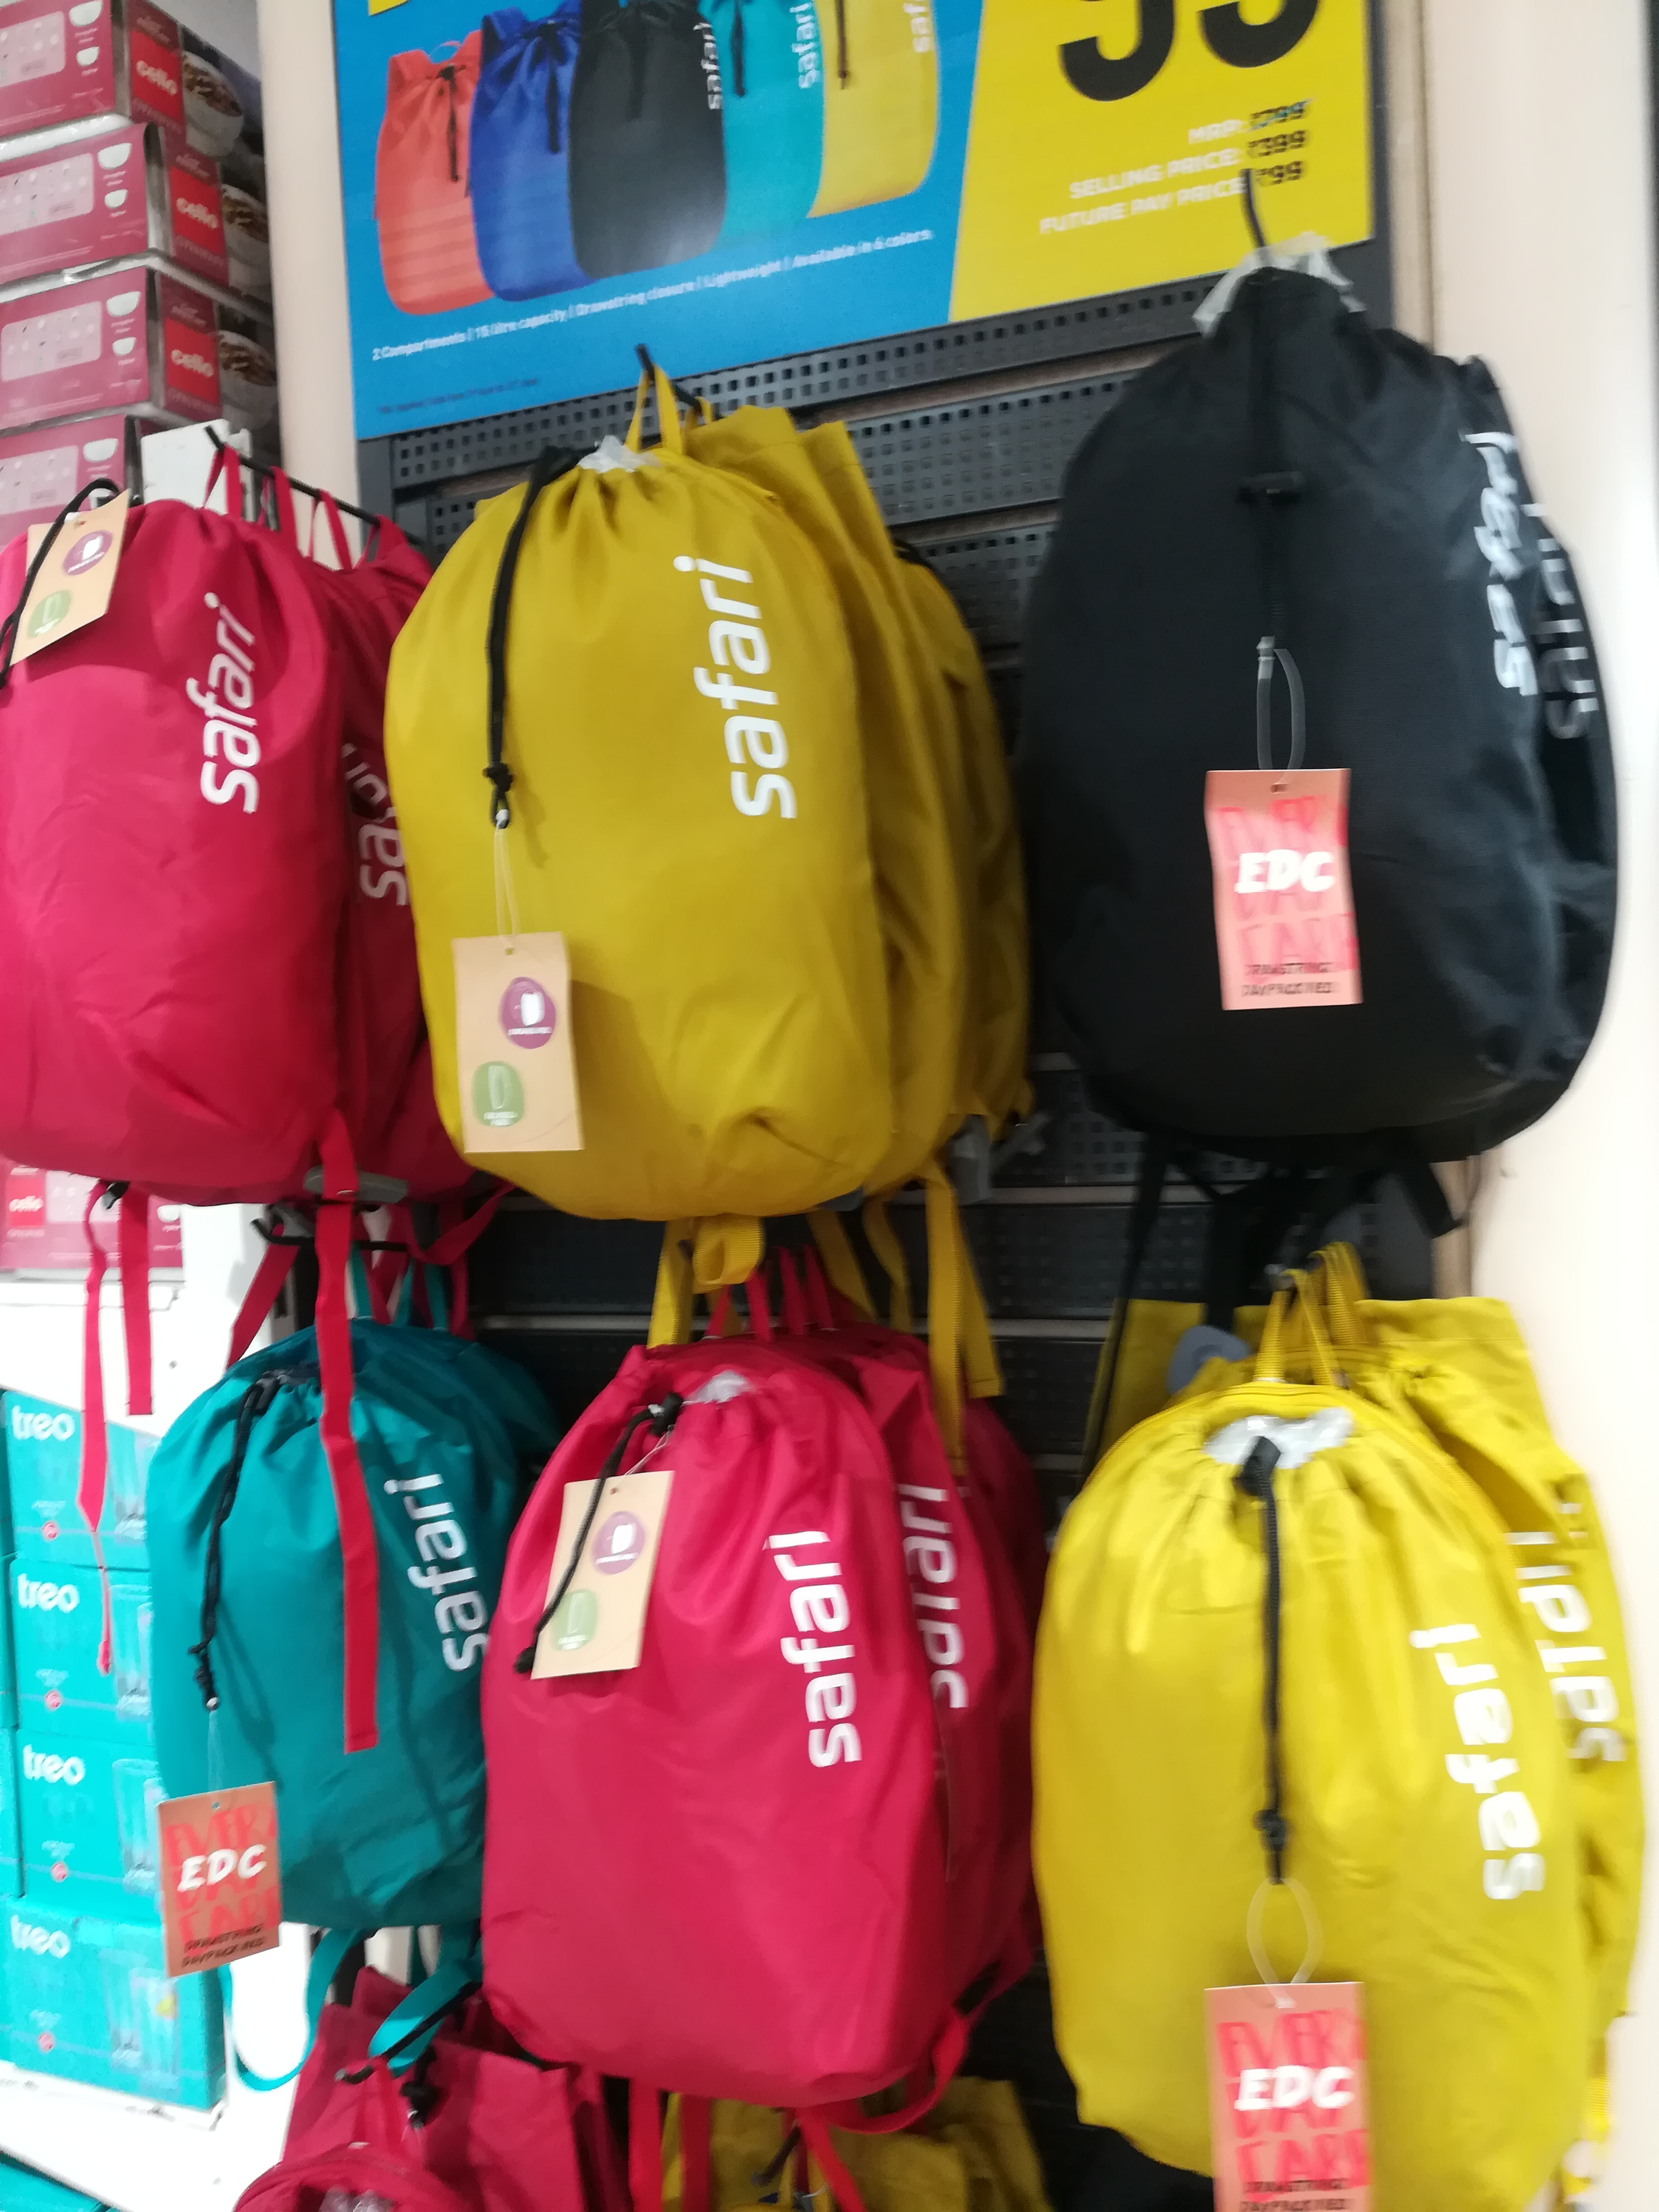 048eba9a9d Safari Backpack @Rs 99 at BigBazaar (Effective Price)